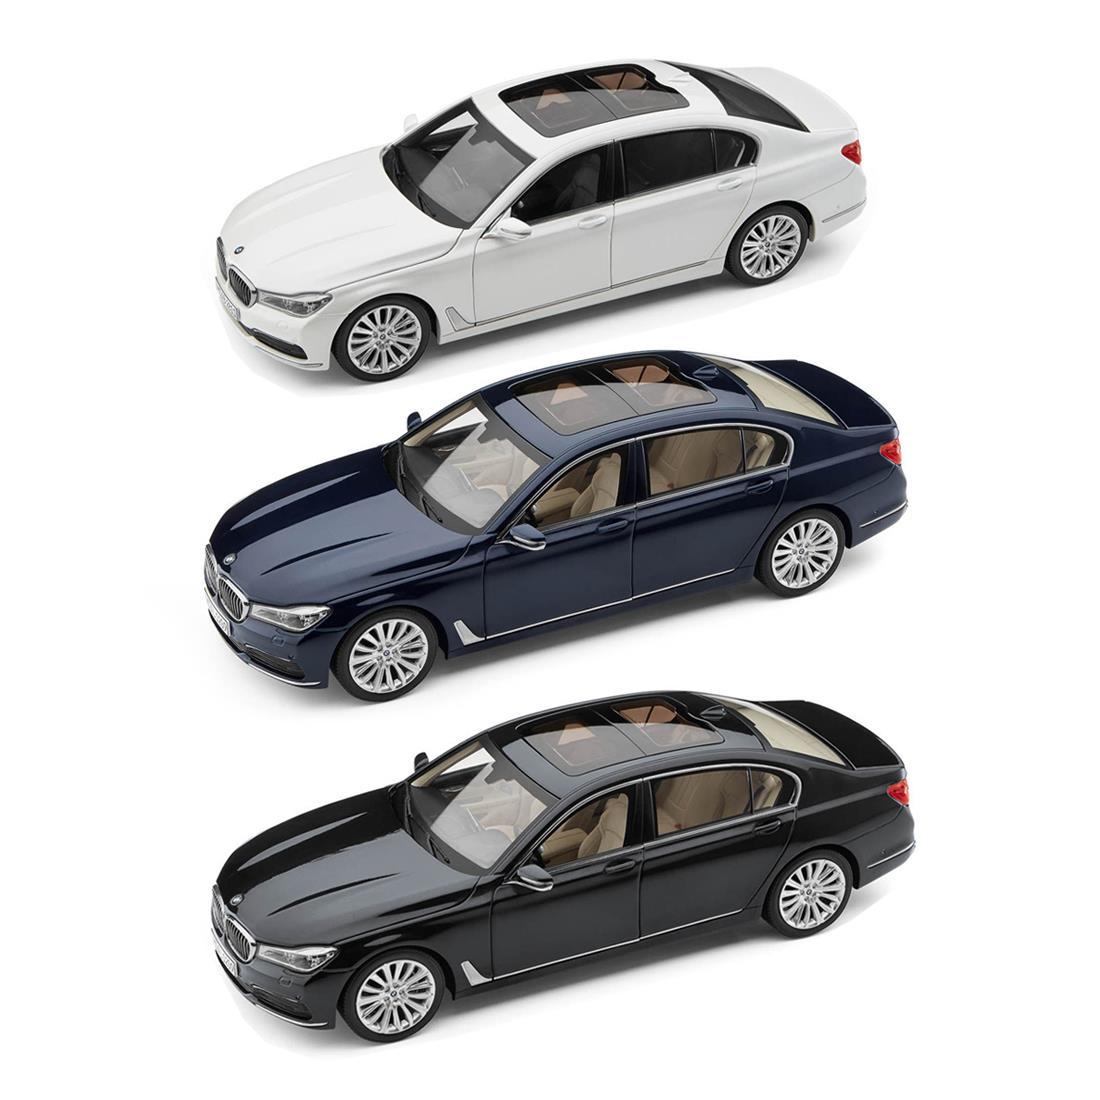 BMW G12 7 Series Long Version Miniature 1:18